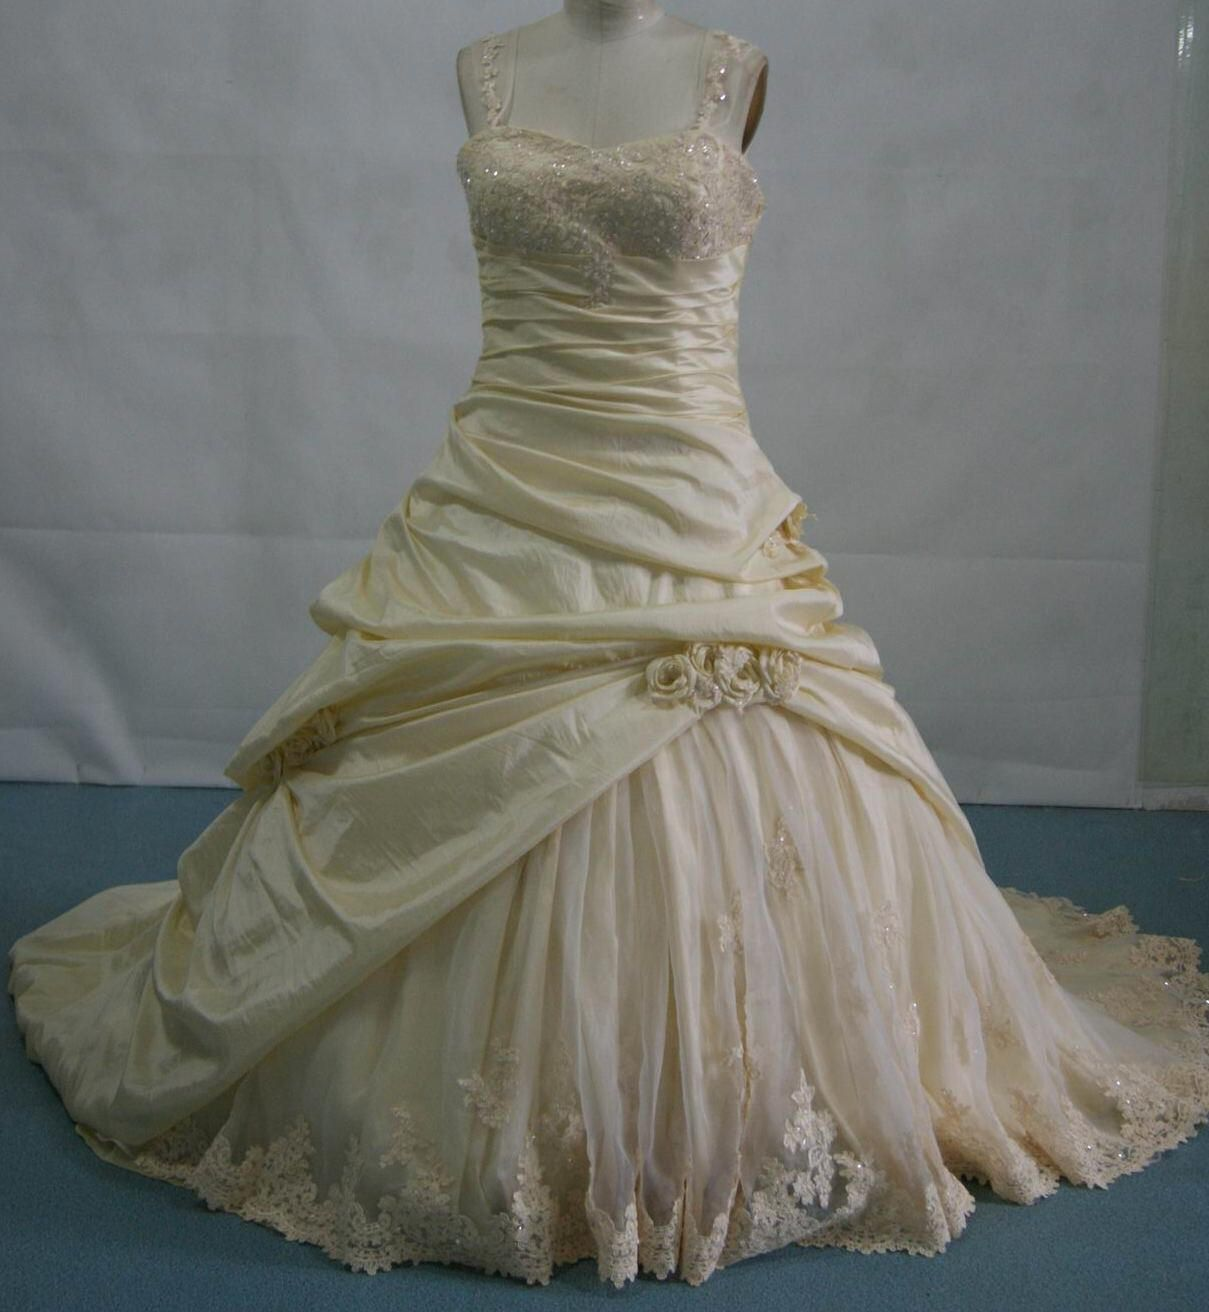 Mindy sabelle cascading bustles on wedding dress ballgown dresses